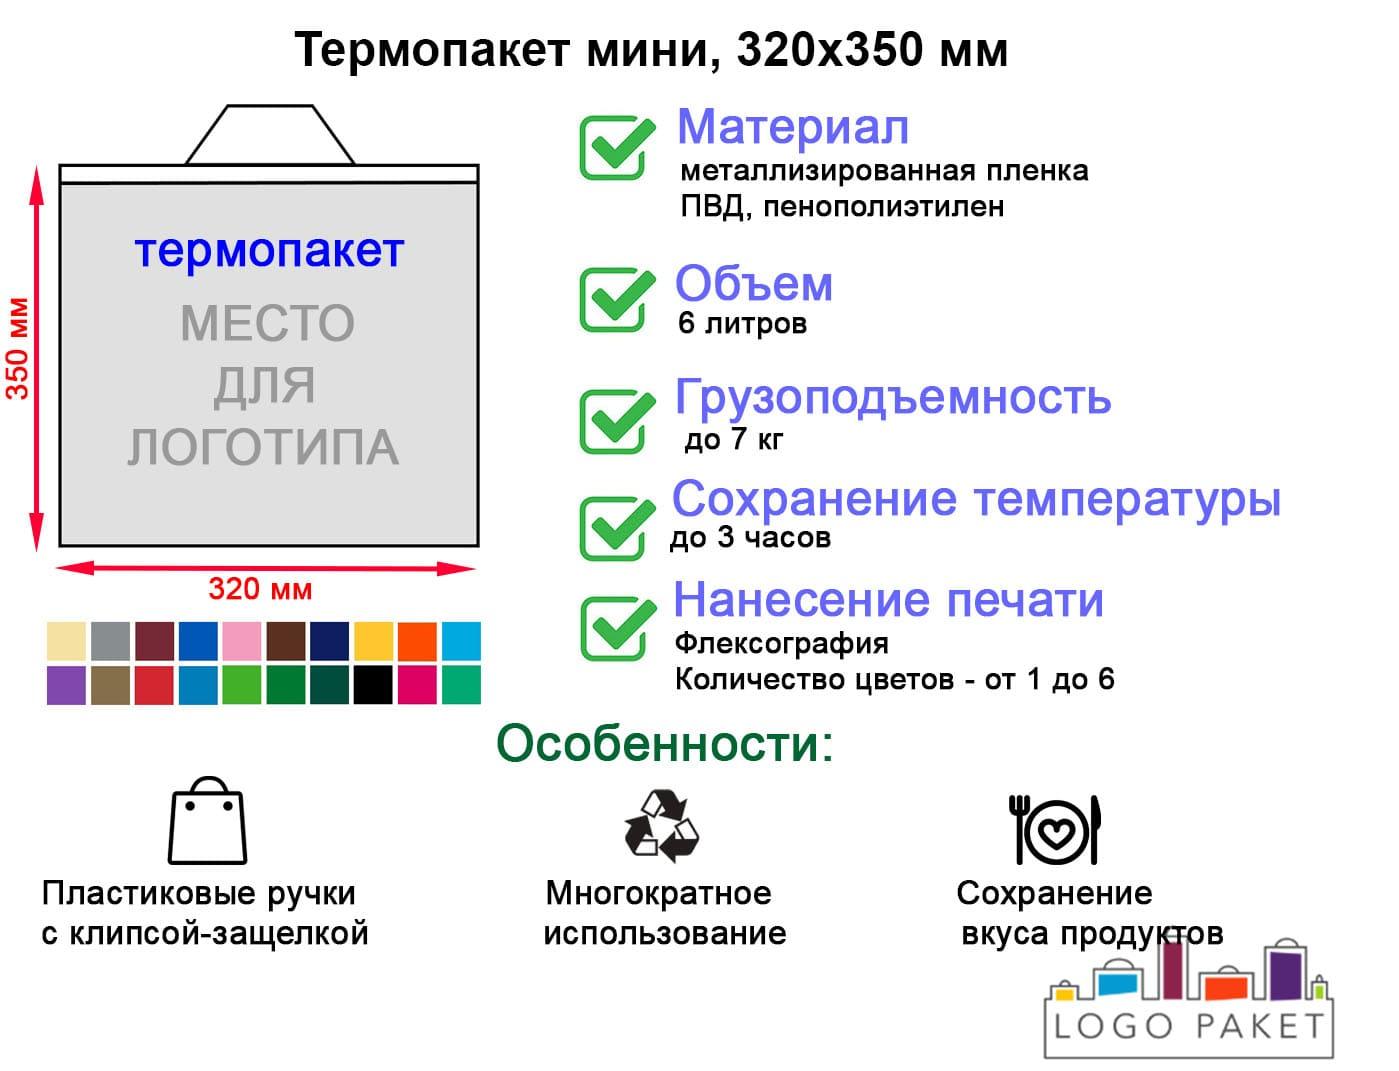 Термопакет Мини, 320х350 мм инфографика